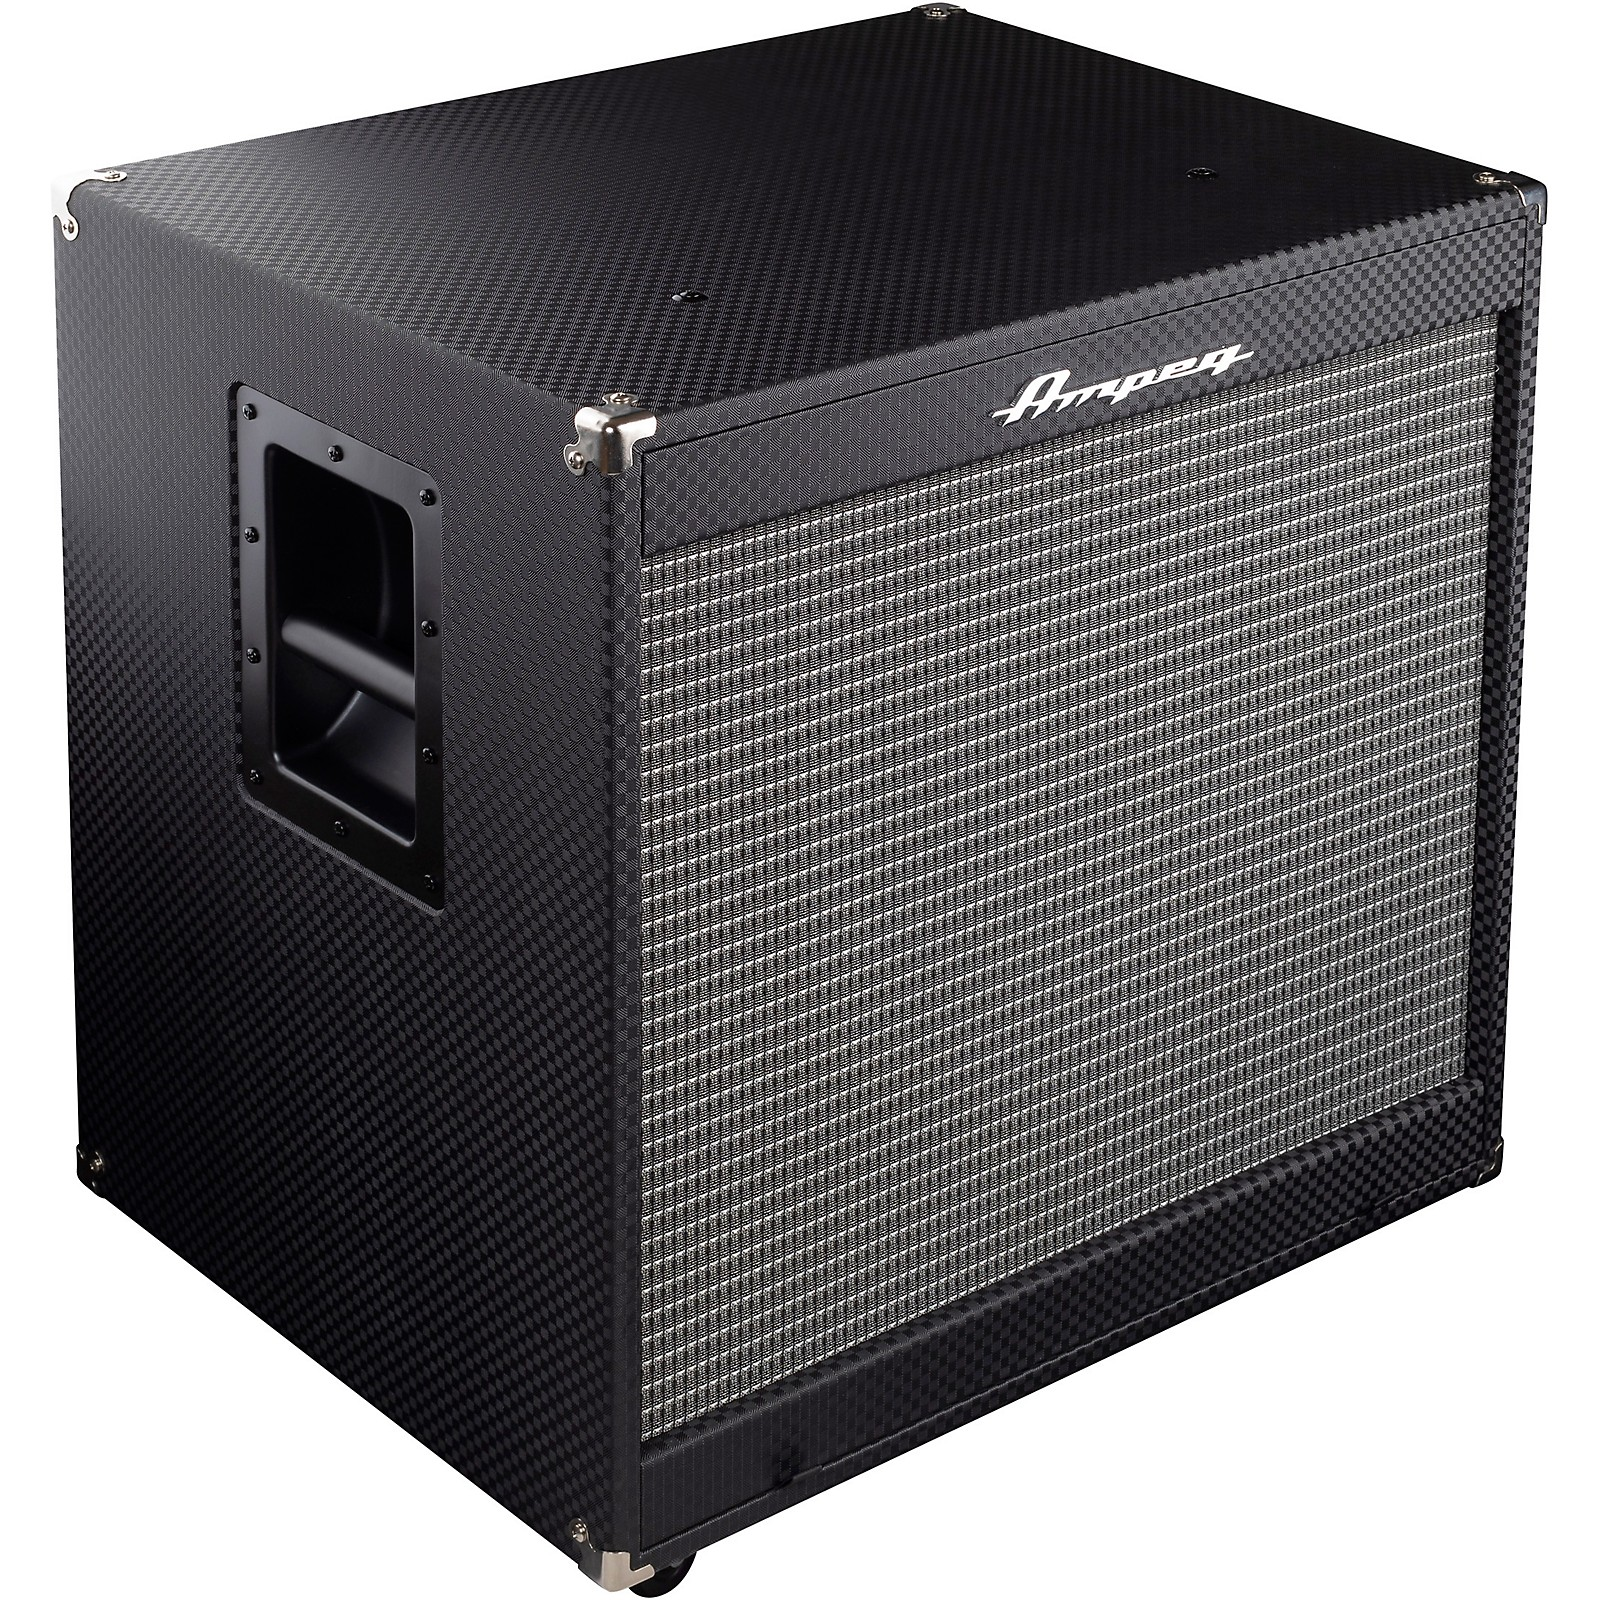 Open Box Ampeg Portaflex Series PF-115LF 1x15 400W Bass Speaker Cabinet